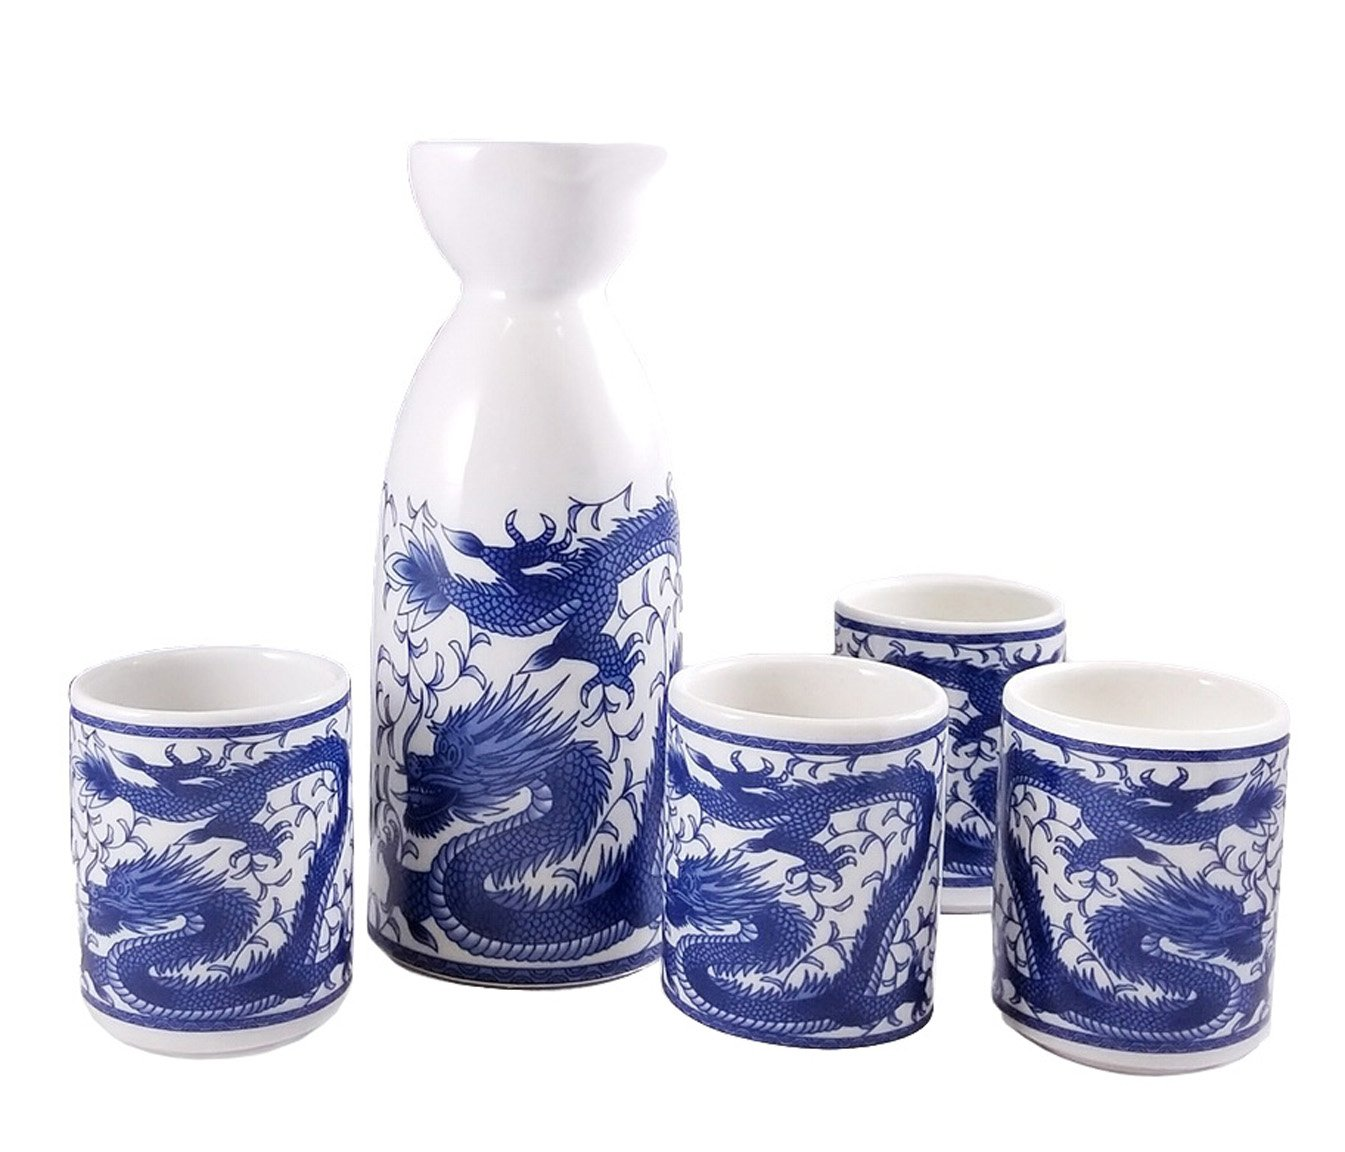 Happy Sales HSSS-DRG11, Royal Dragon Sake Set, White and Blue by Happy Sales